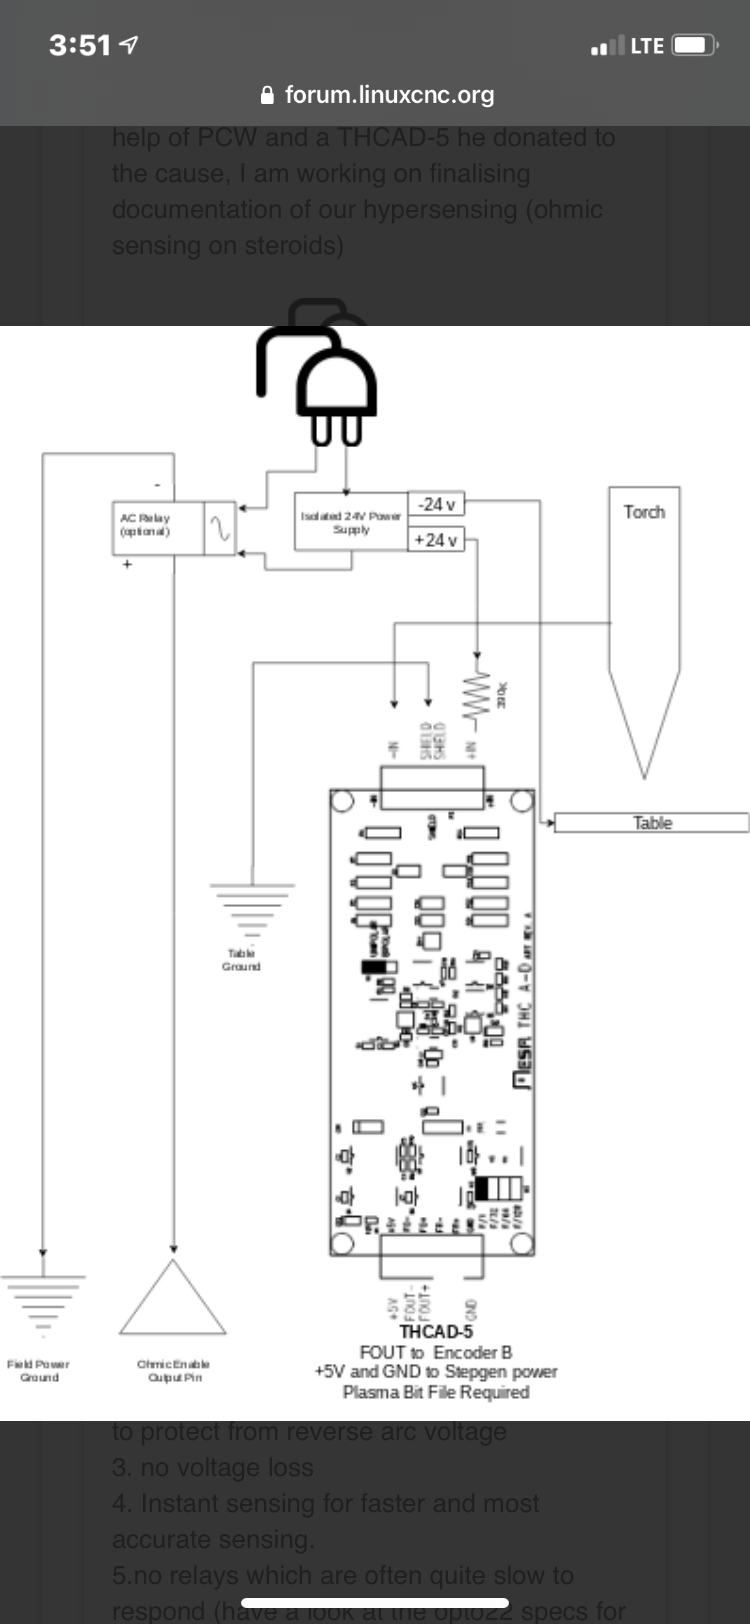 C611268C-7B08-45BD-A2EA-FA7F12B4954C.png